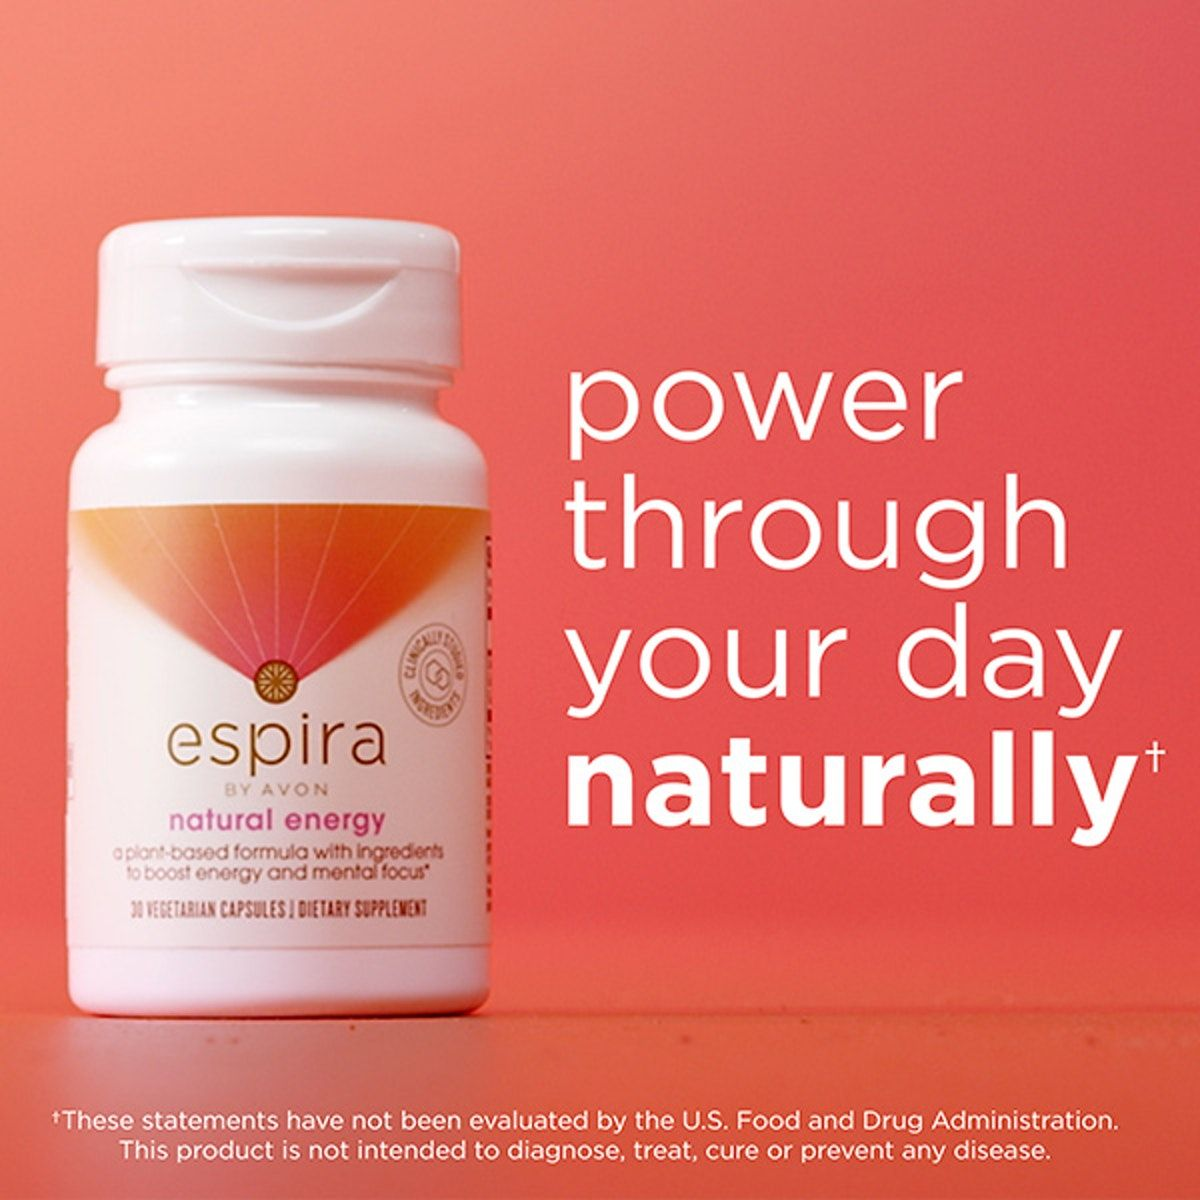 Espira Avon S New Health Wellness Line Keeping You Beautiful Inside And Out Avon Espira Health Wellness B Natural Energy Avon Health And Wellness